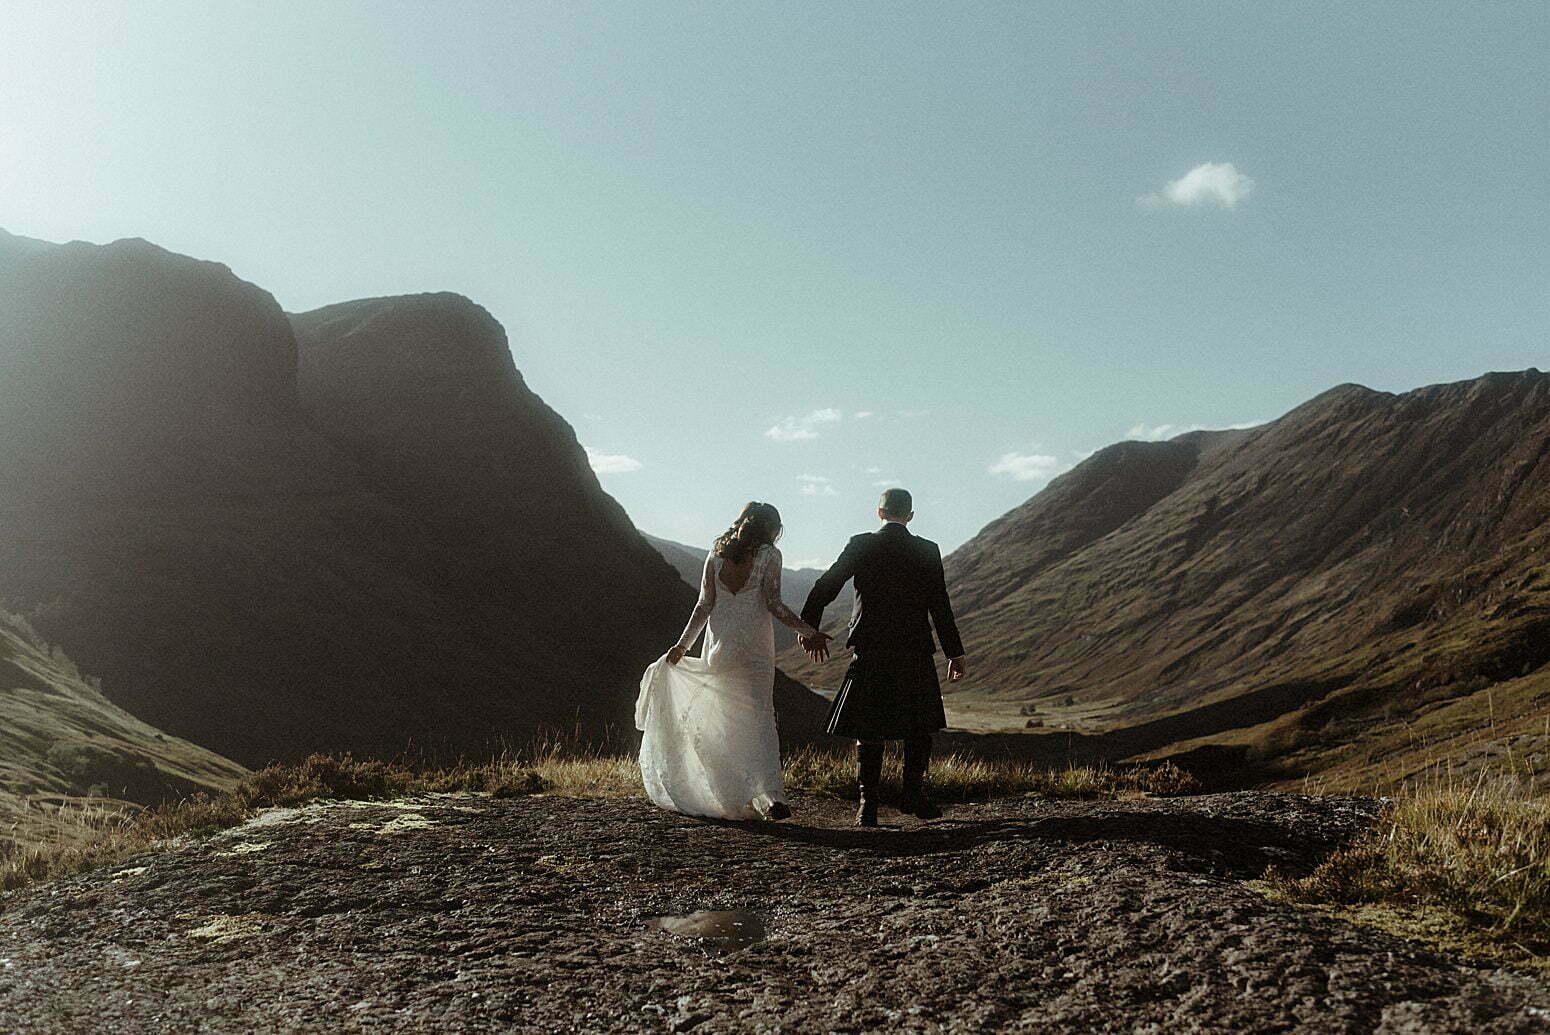 Glencoe elopement taking place